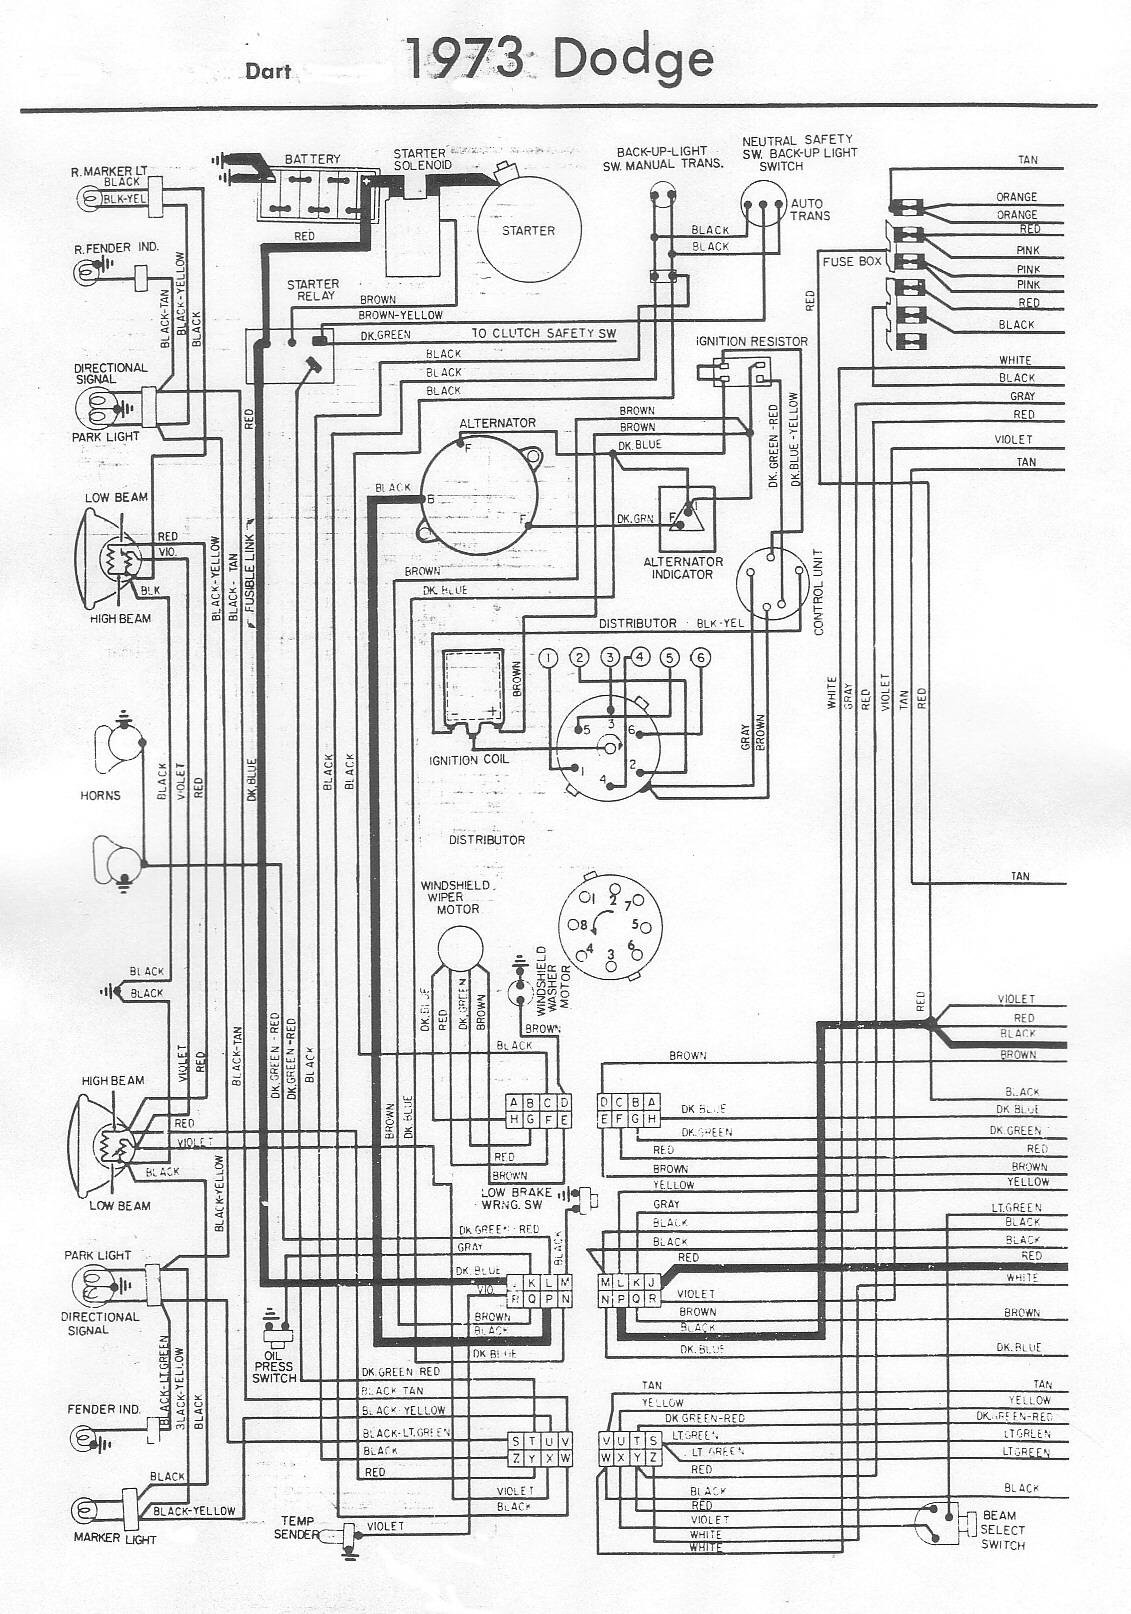 73 dodge dart wiring diagram wiring diagrams data 1973 dodge dart engine wiring harness 1973 dodge dart wiring harness [ 1131 x 1614 Pixel ]